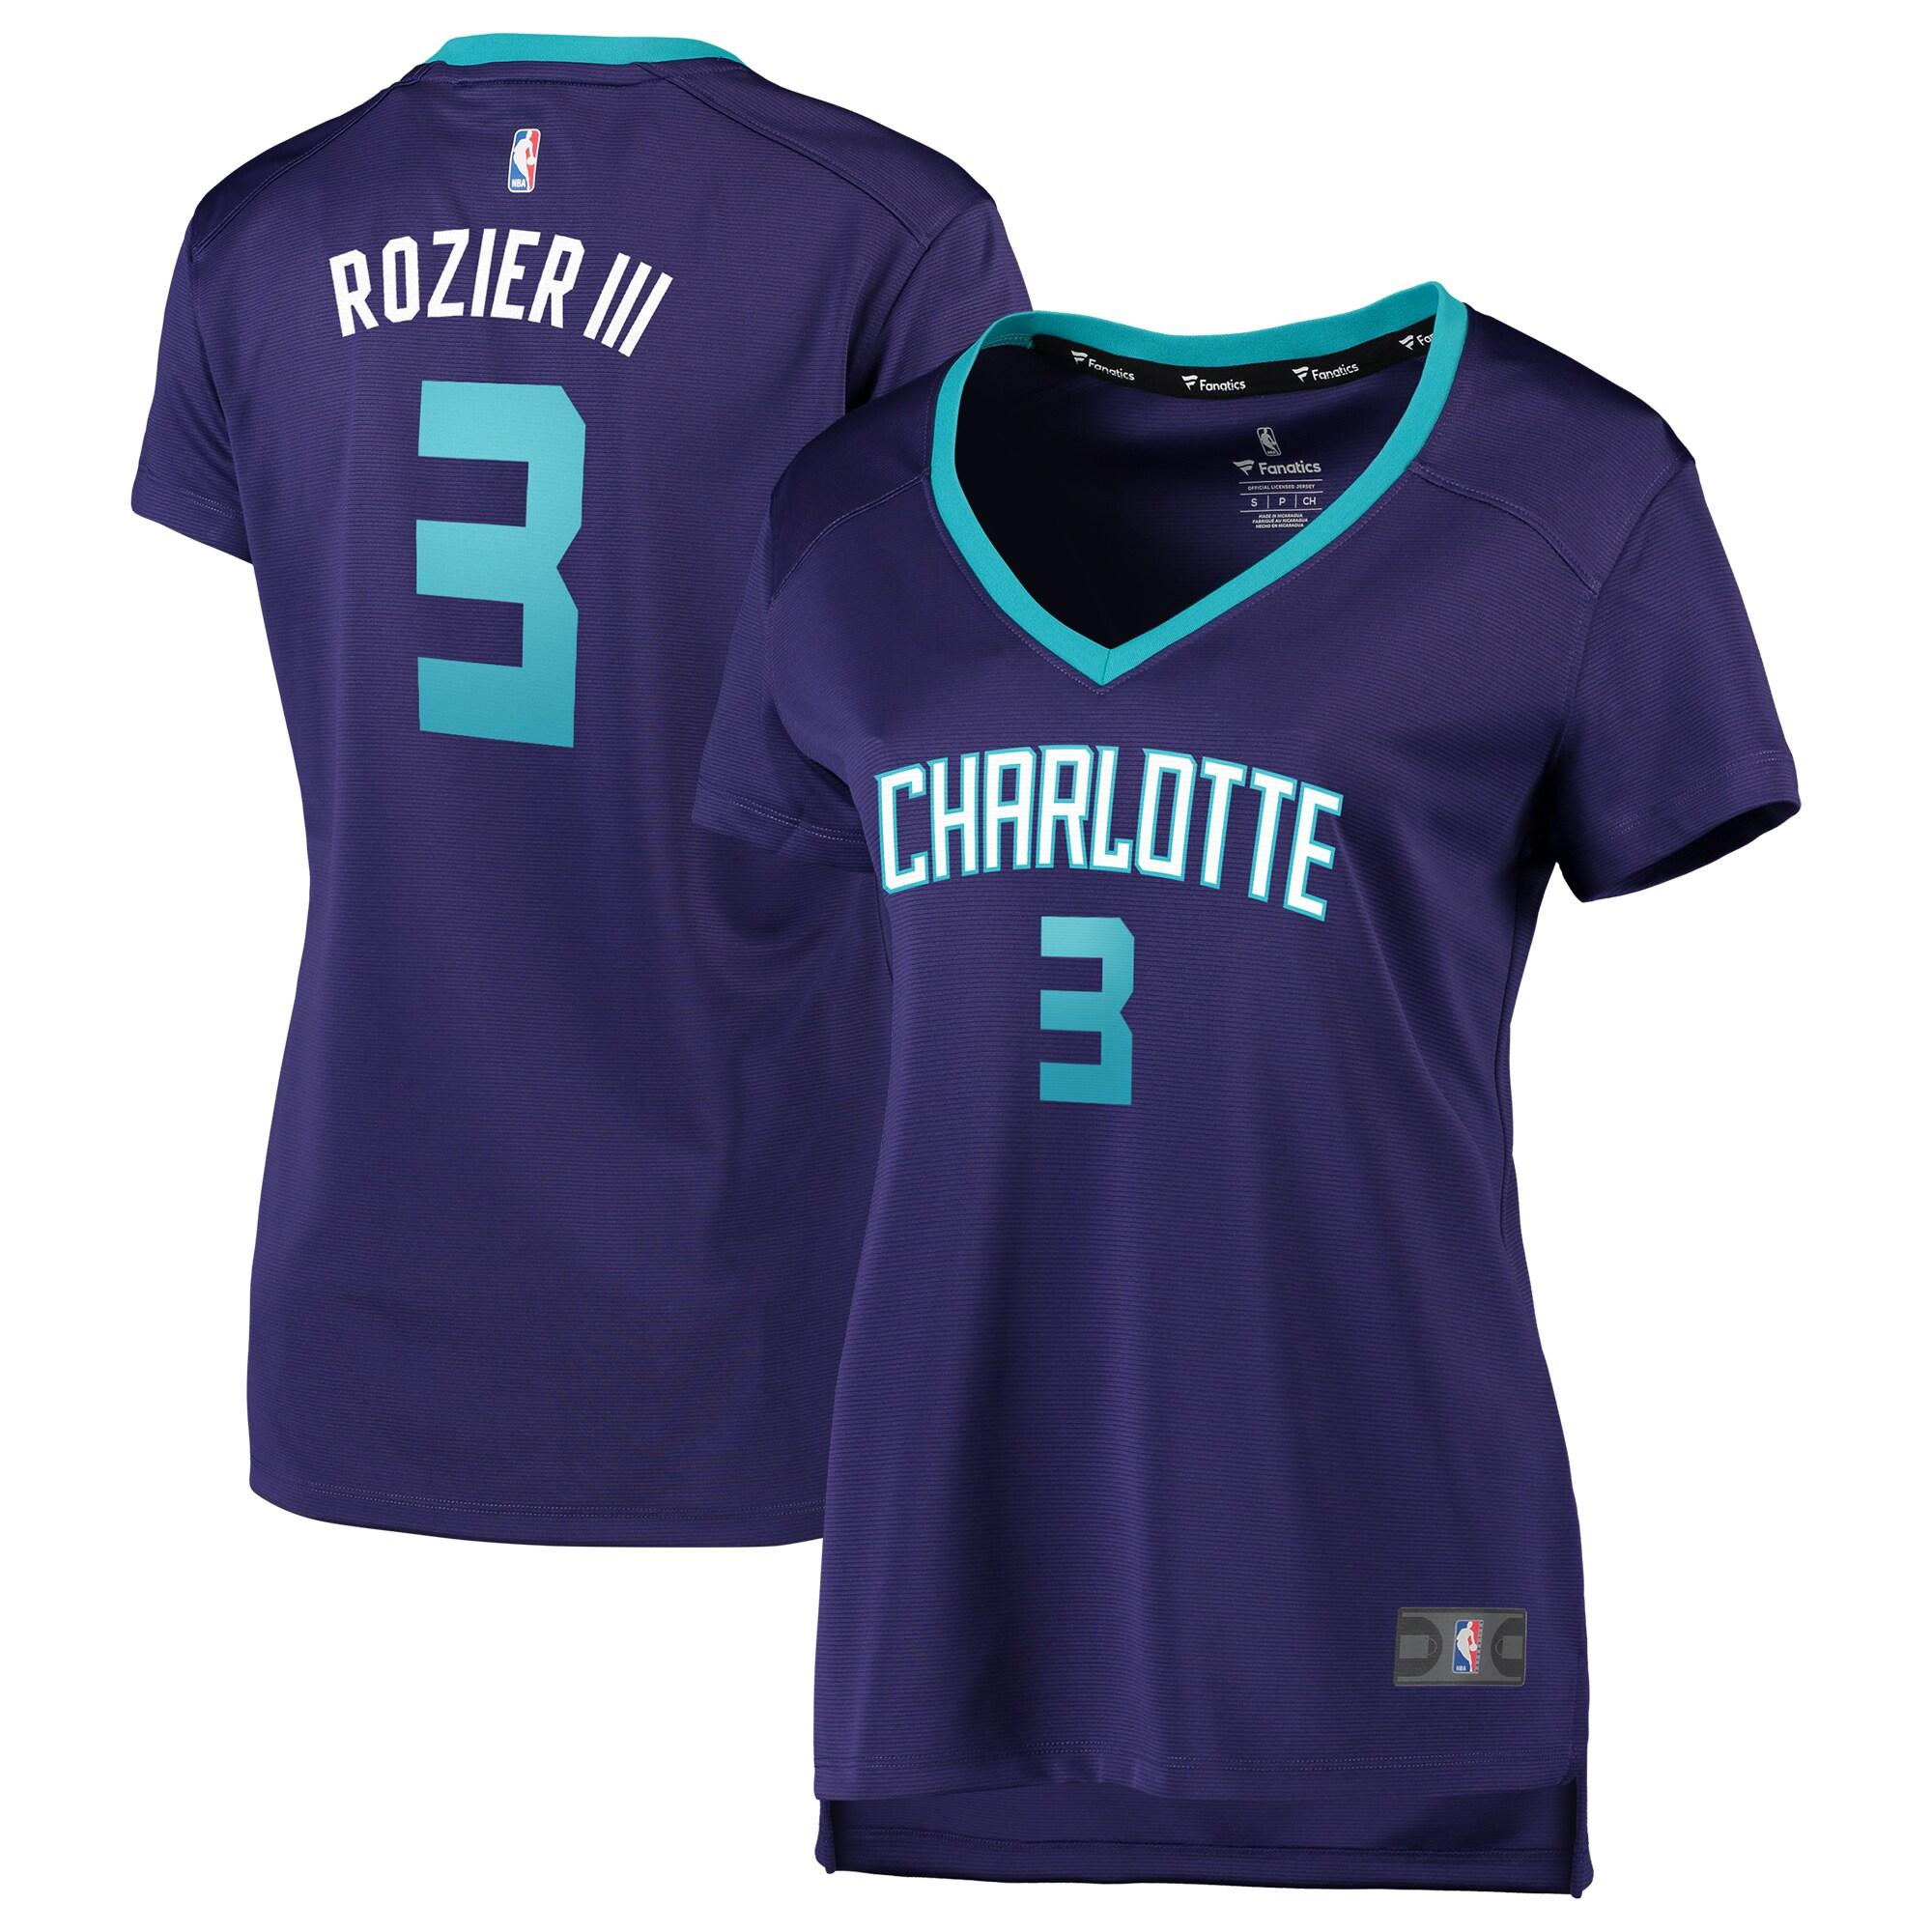 Terry Rozier Charlotte Hornets Fanatics Branded Women's Fast Break Replica Jersey Purple - Statement Edition